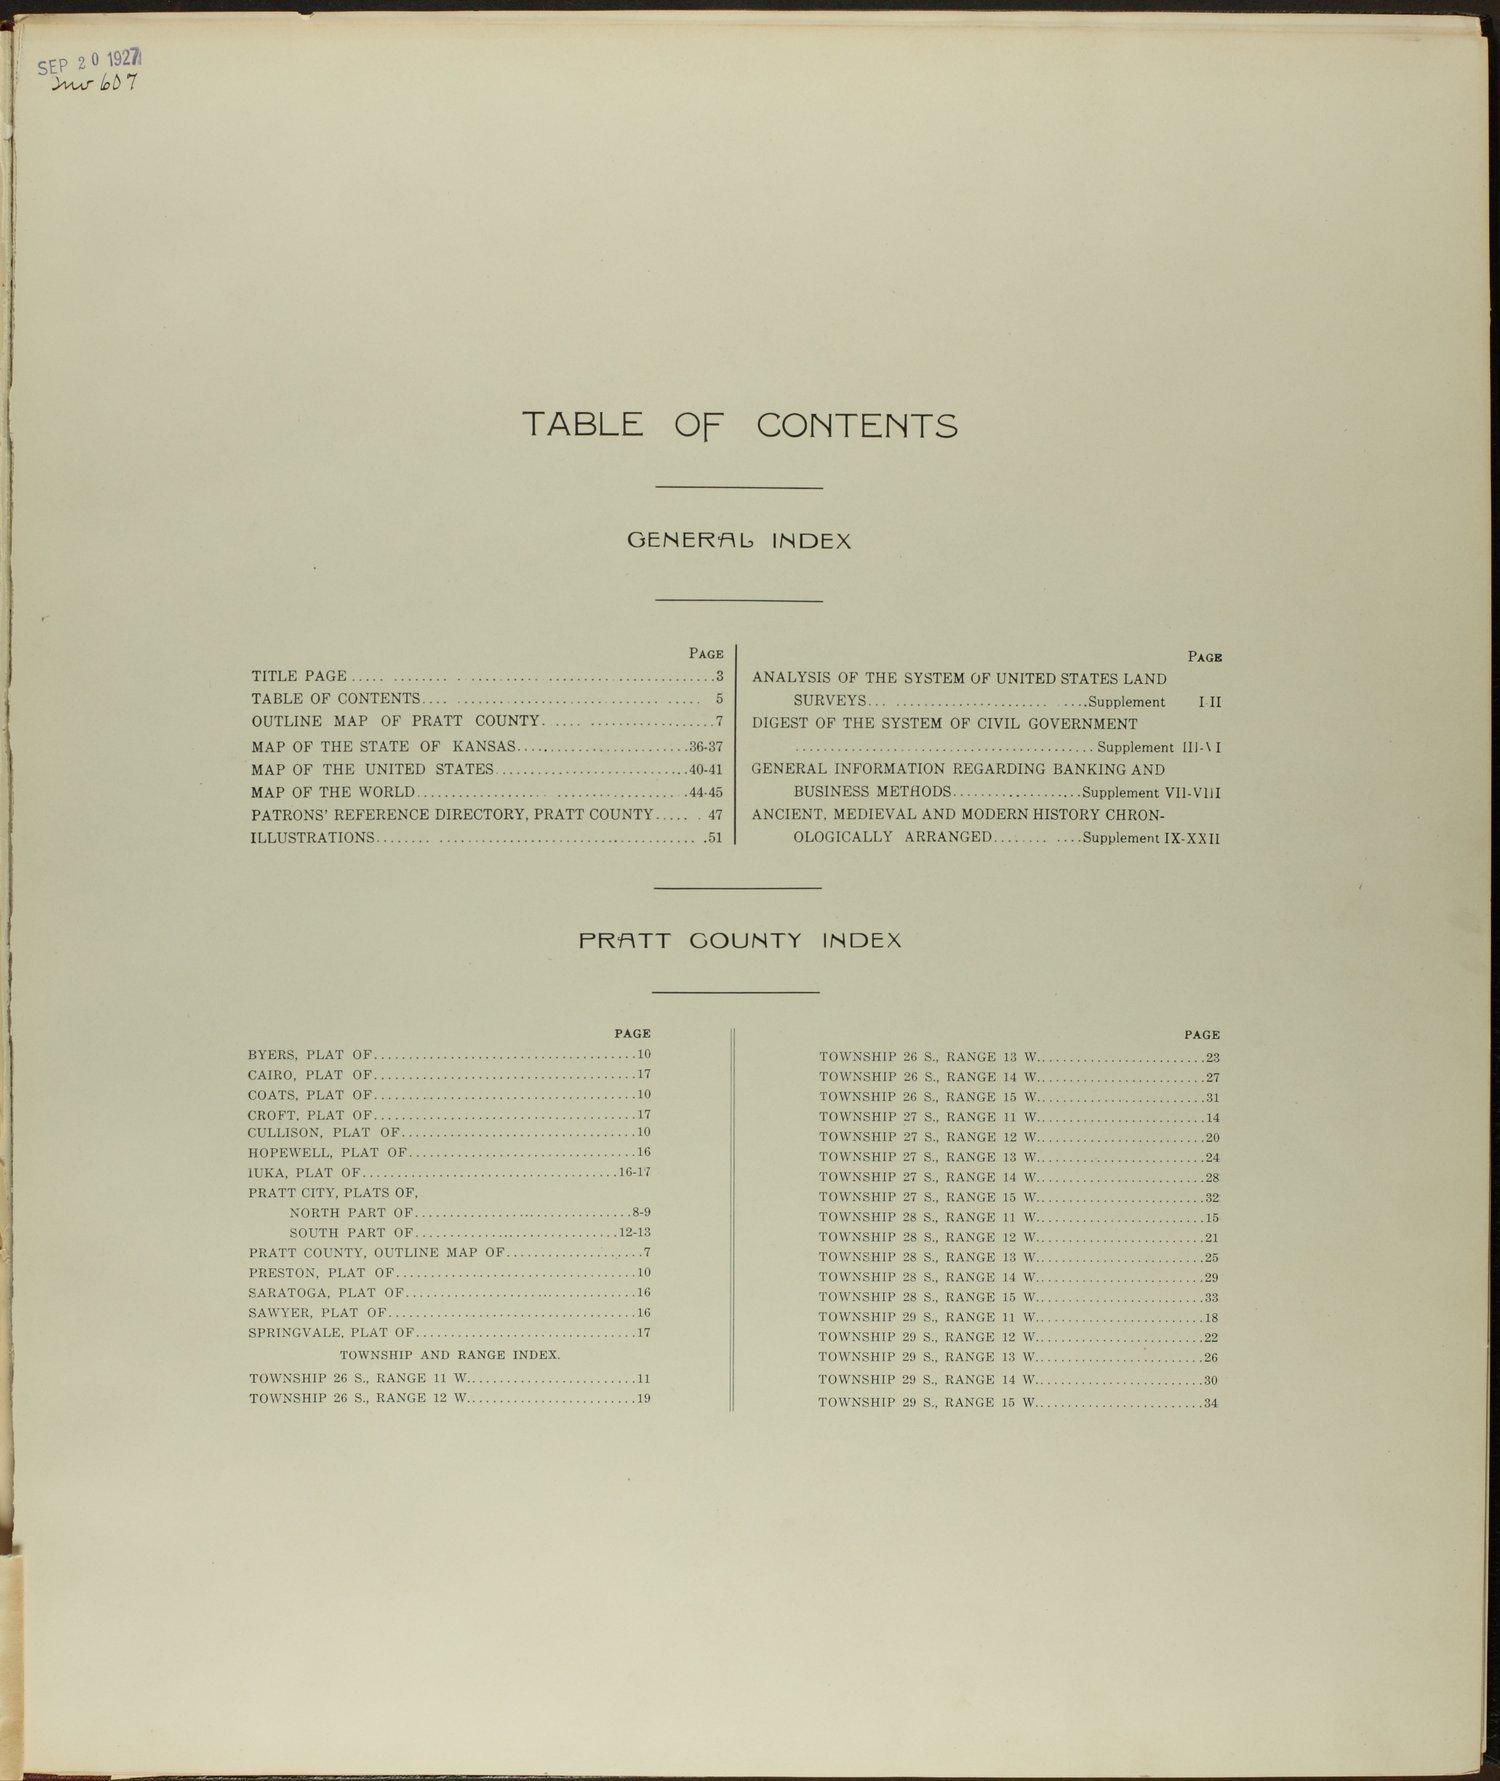 Standard atlas of Pratt County, Kansas - Table of Contents